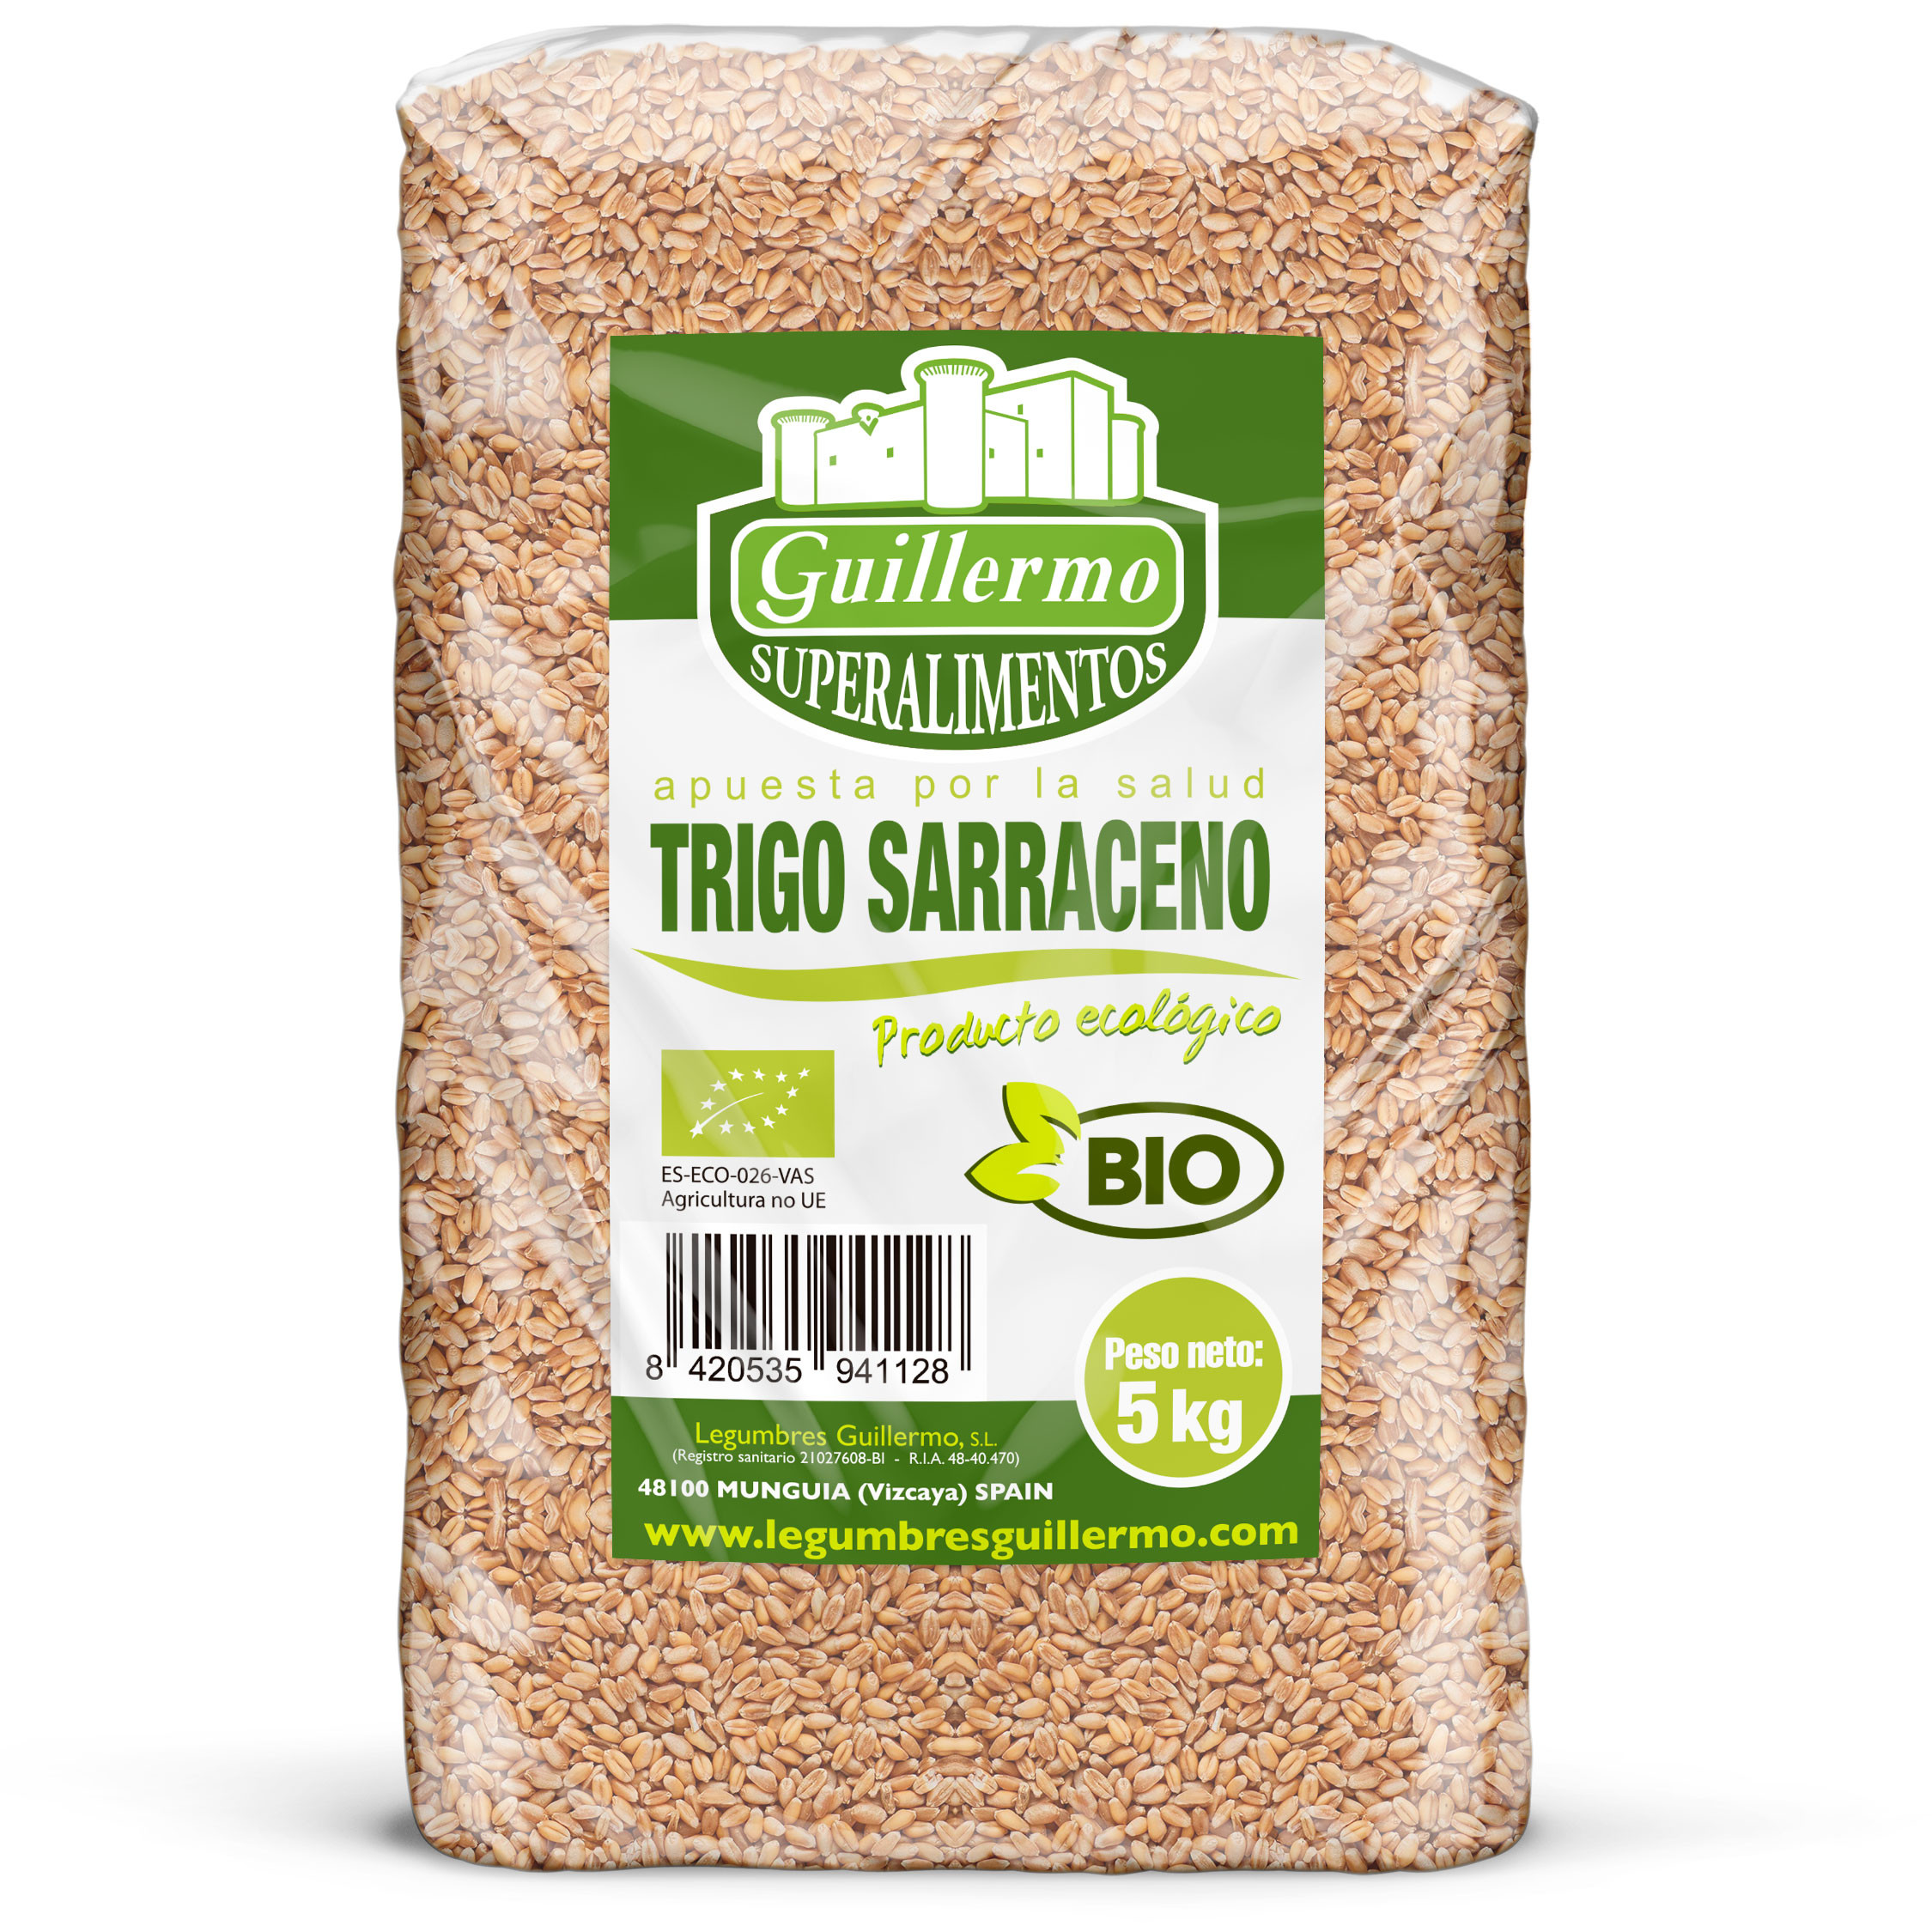 Guillermo Horeca Trigo Sarraceno Ecológico BIO Granel Superalimento 100% Natural 5kg